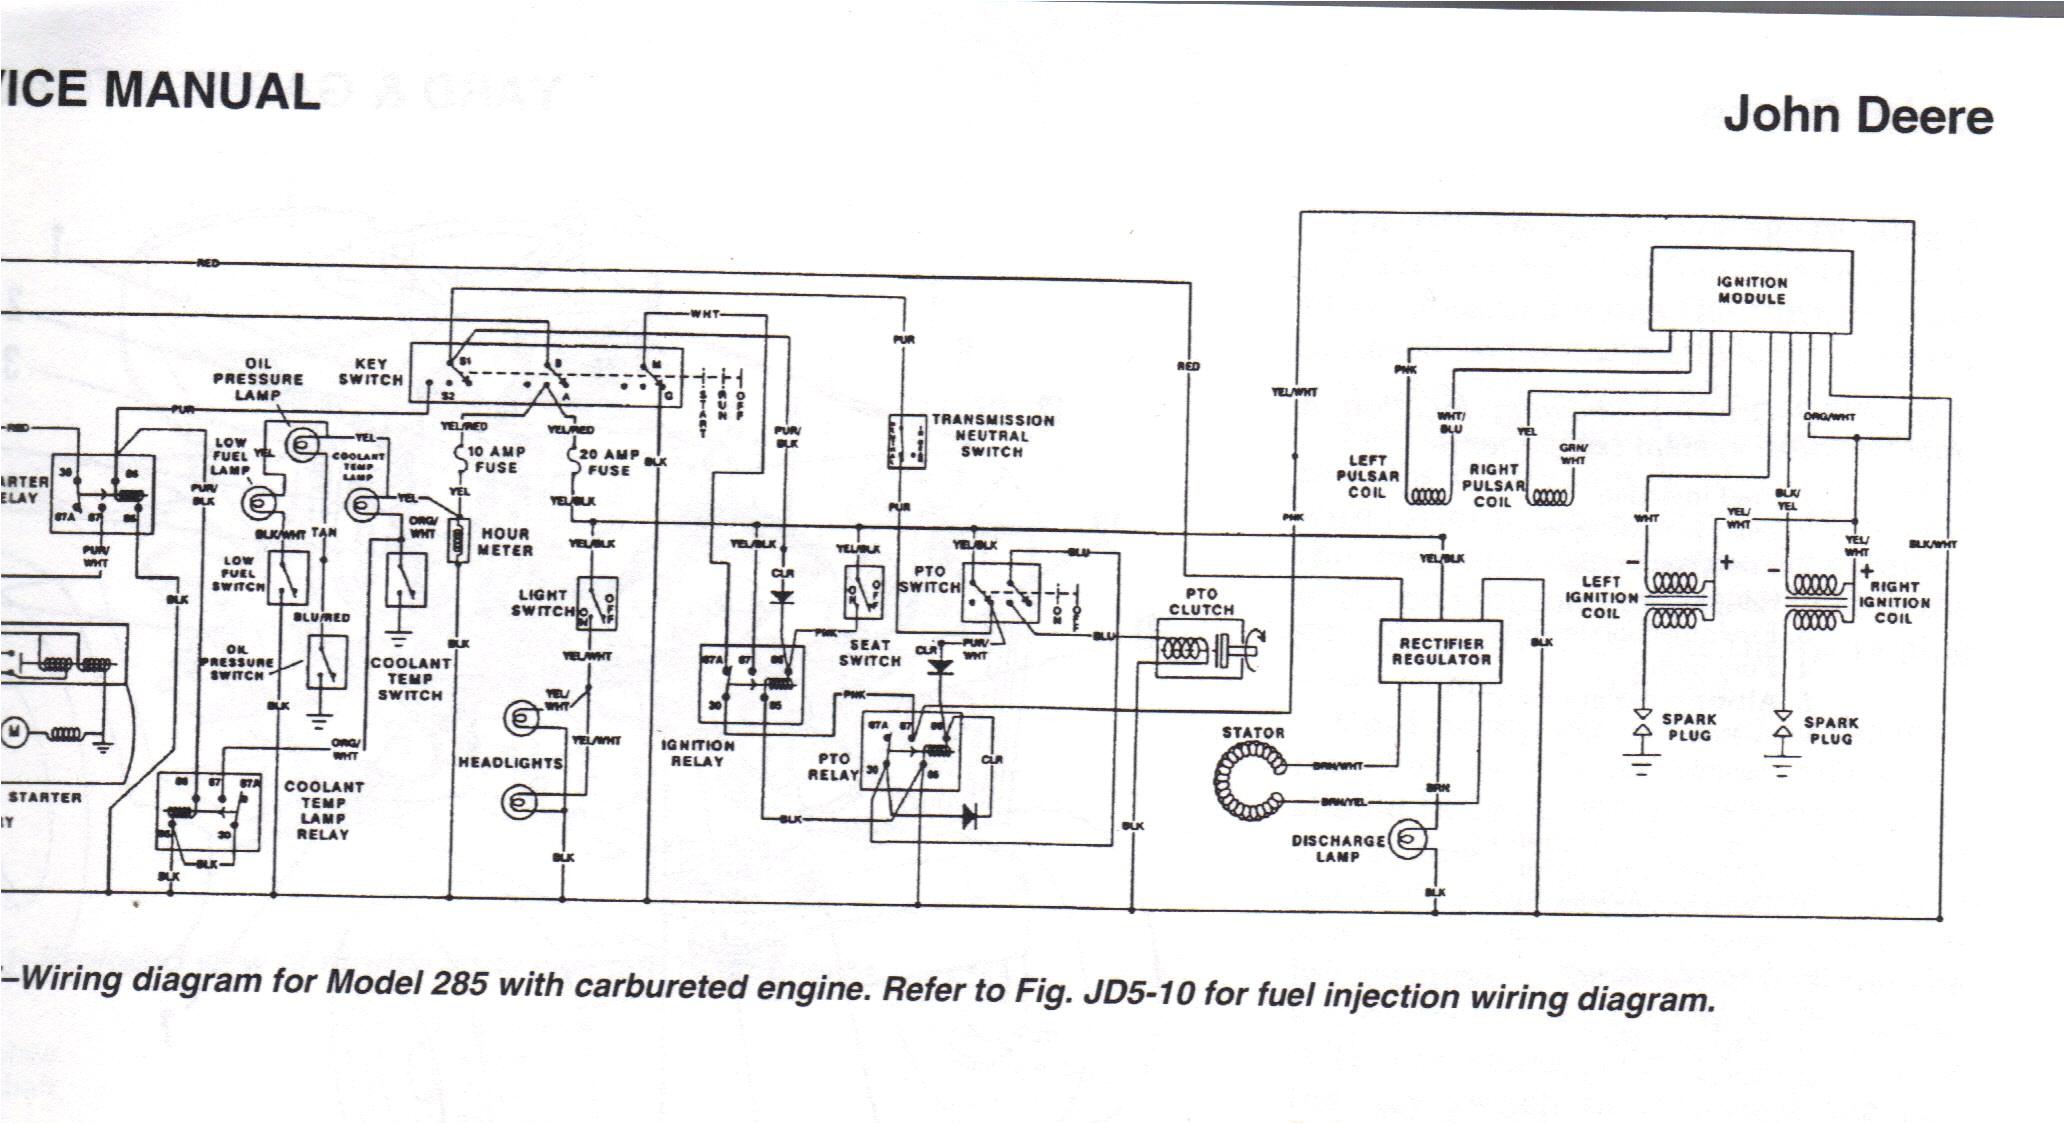 wiring diagram for john deere 4250 wiring diagram paper john deere 400 garden tractor wiring diagram john deere 400 wiring diagram